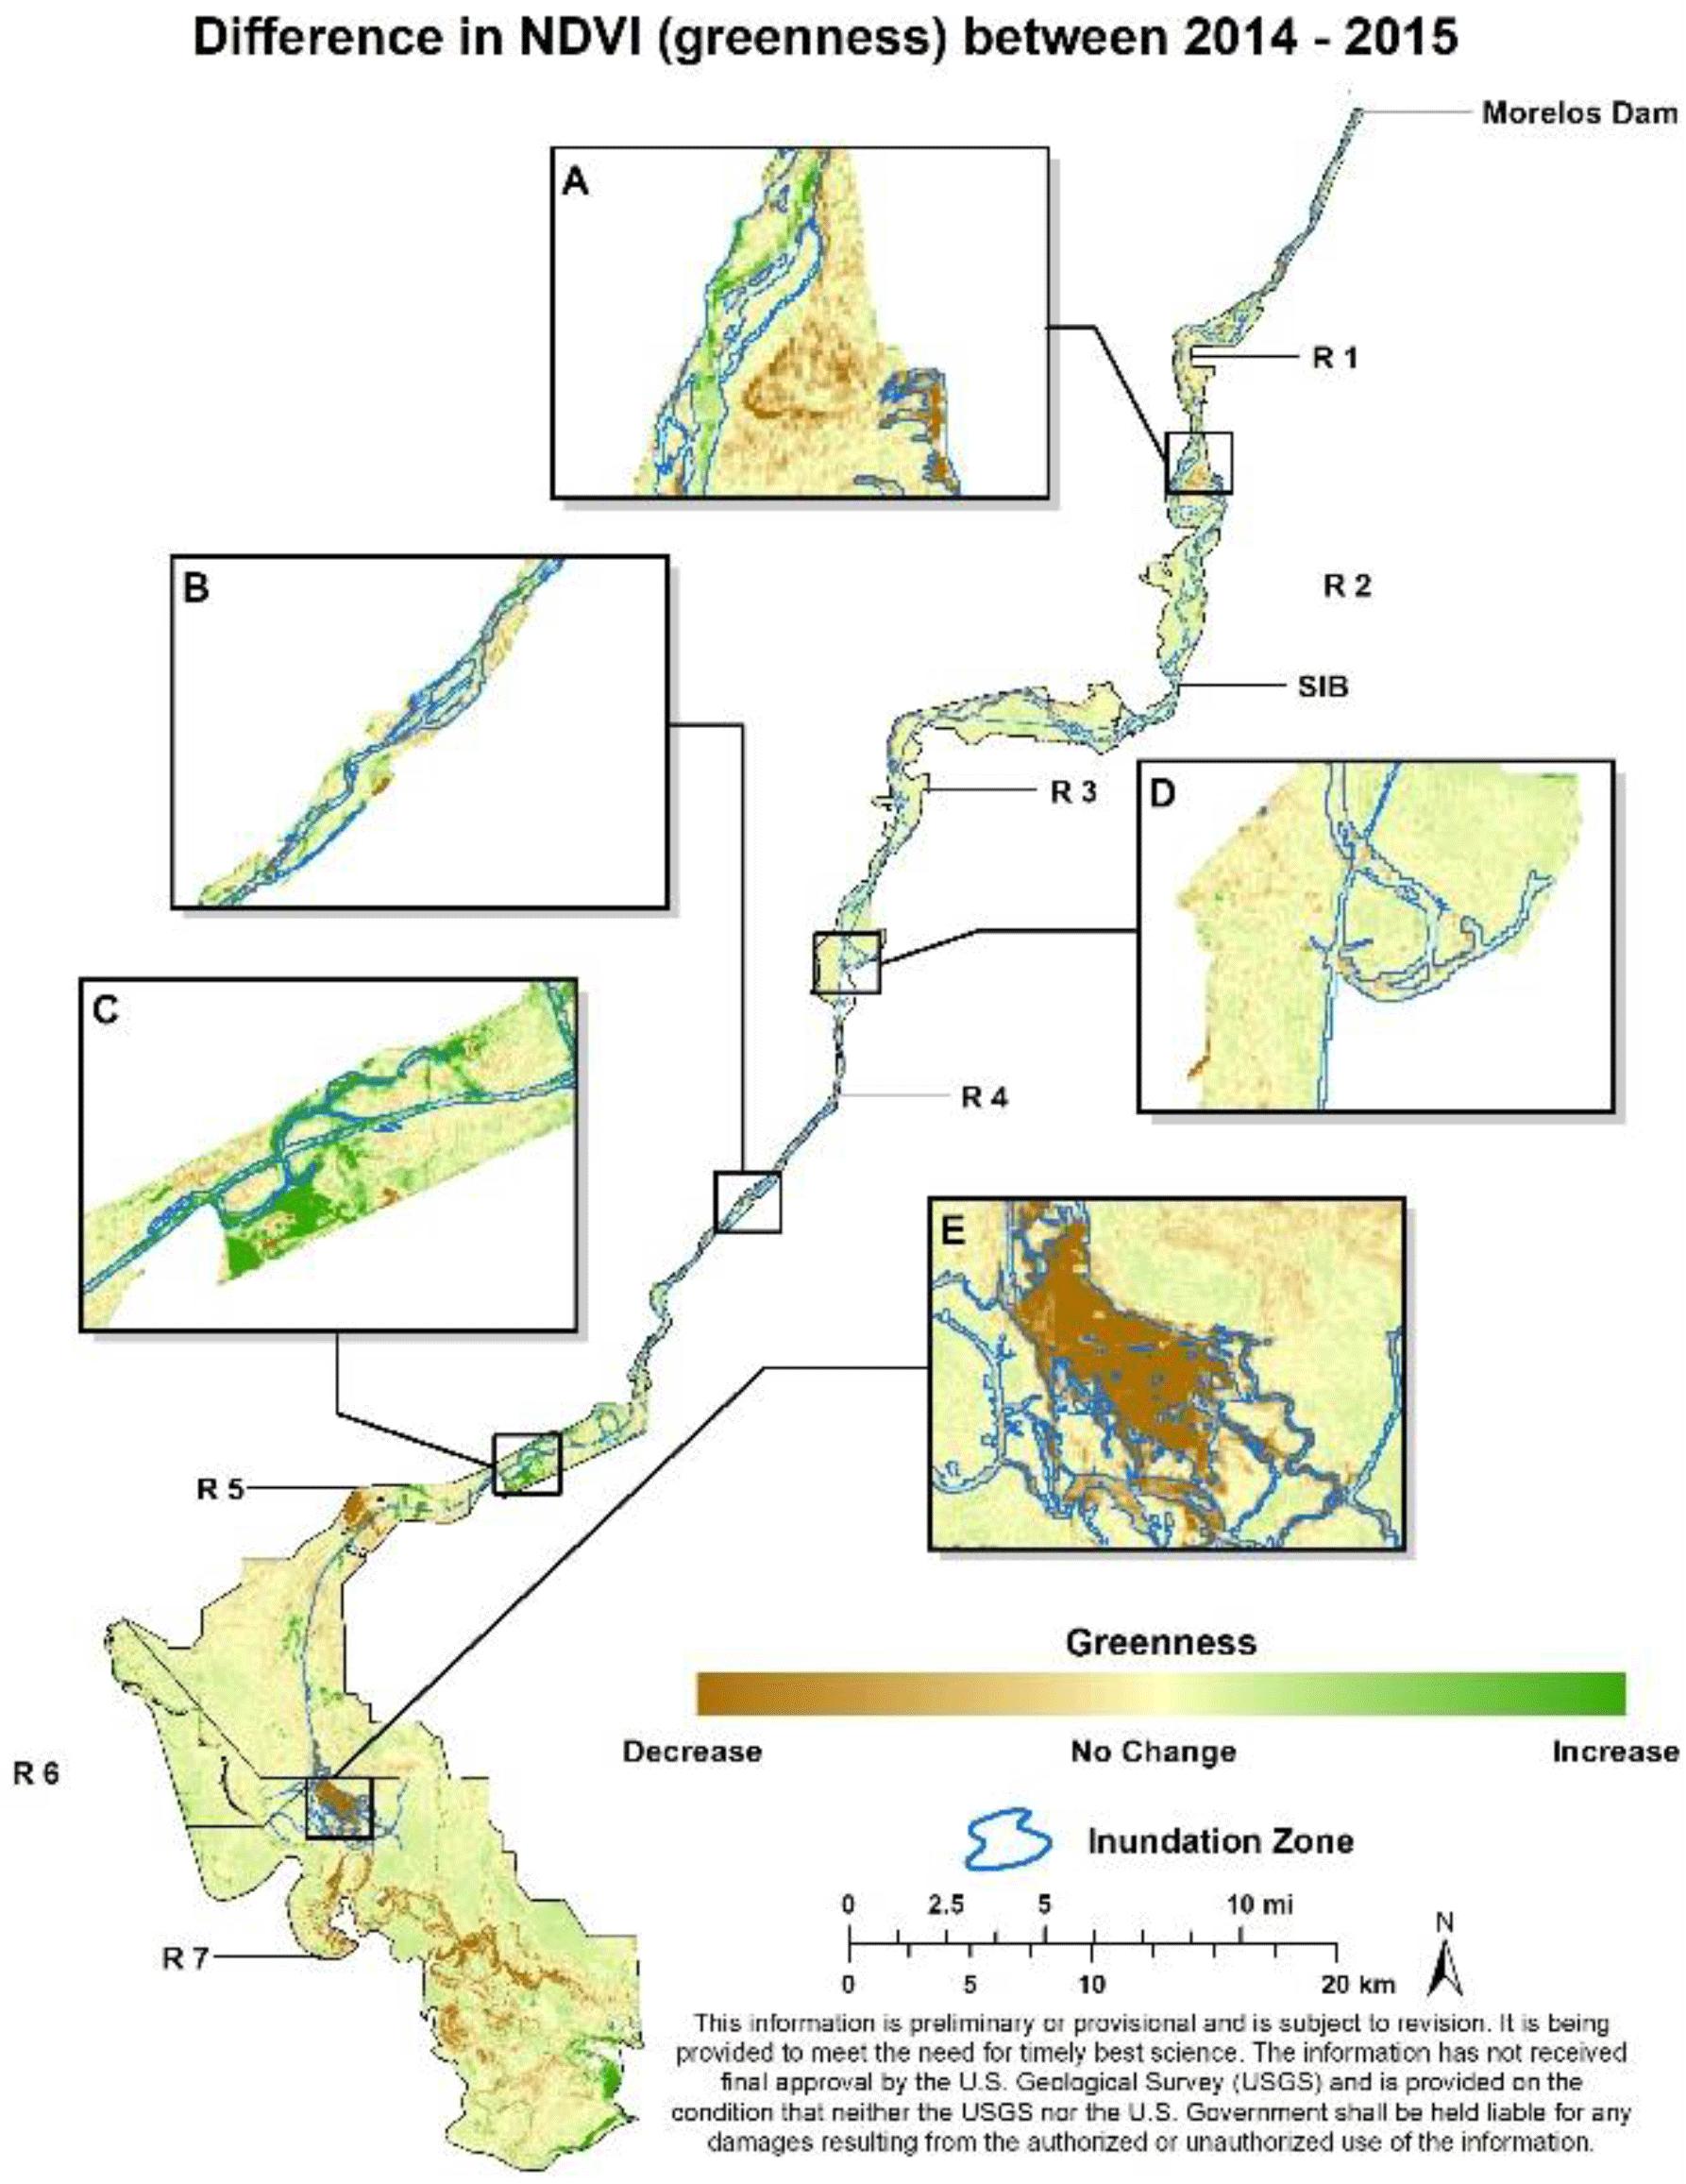 PIAHS - Remote sensing vegetation index methods to evaluate changes